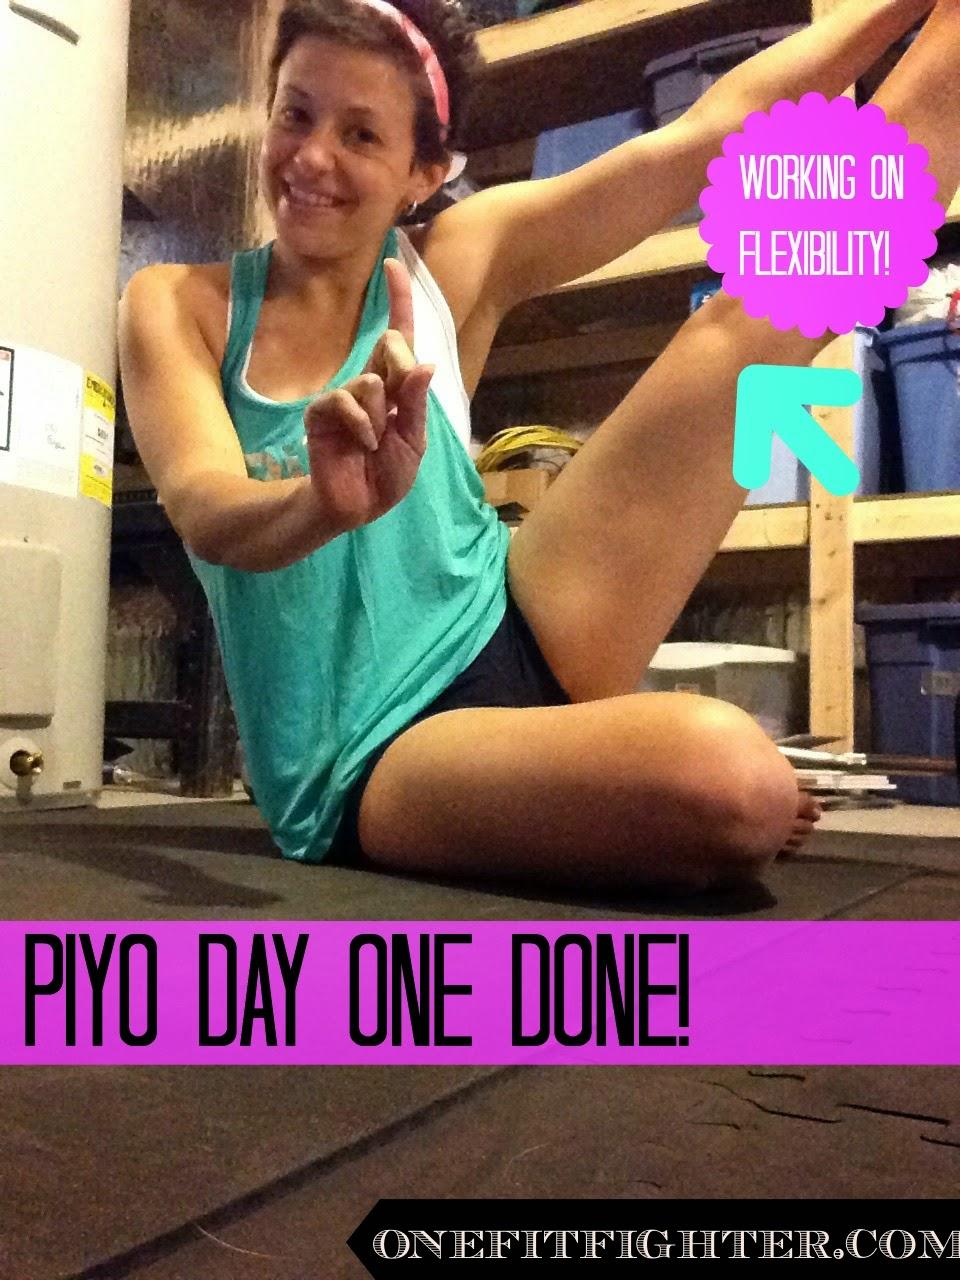 does piyo increase flexibility